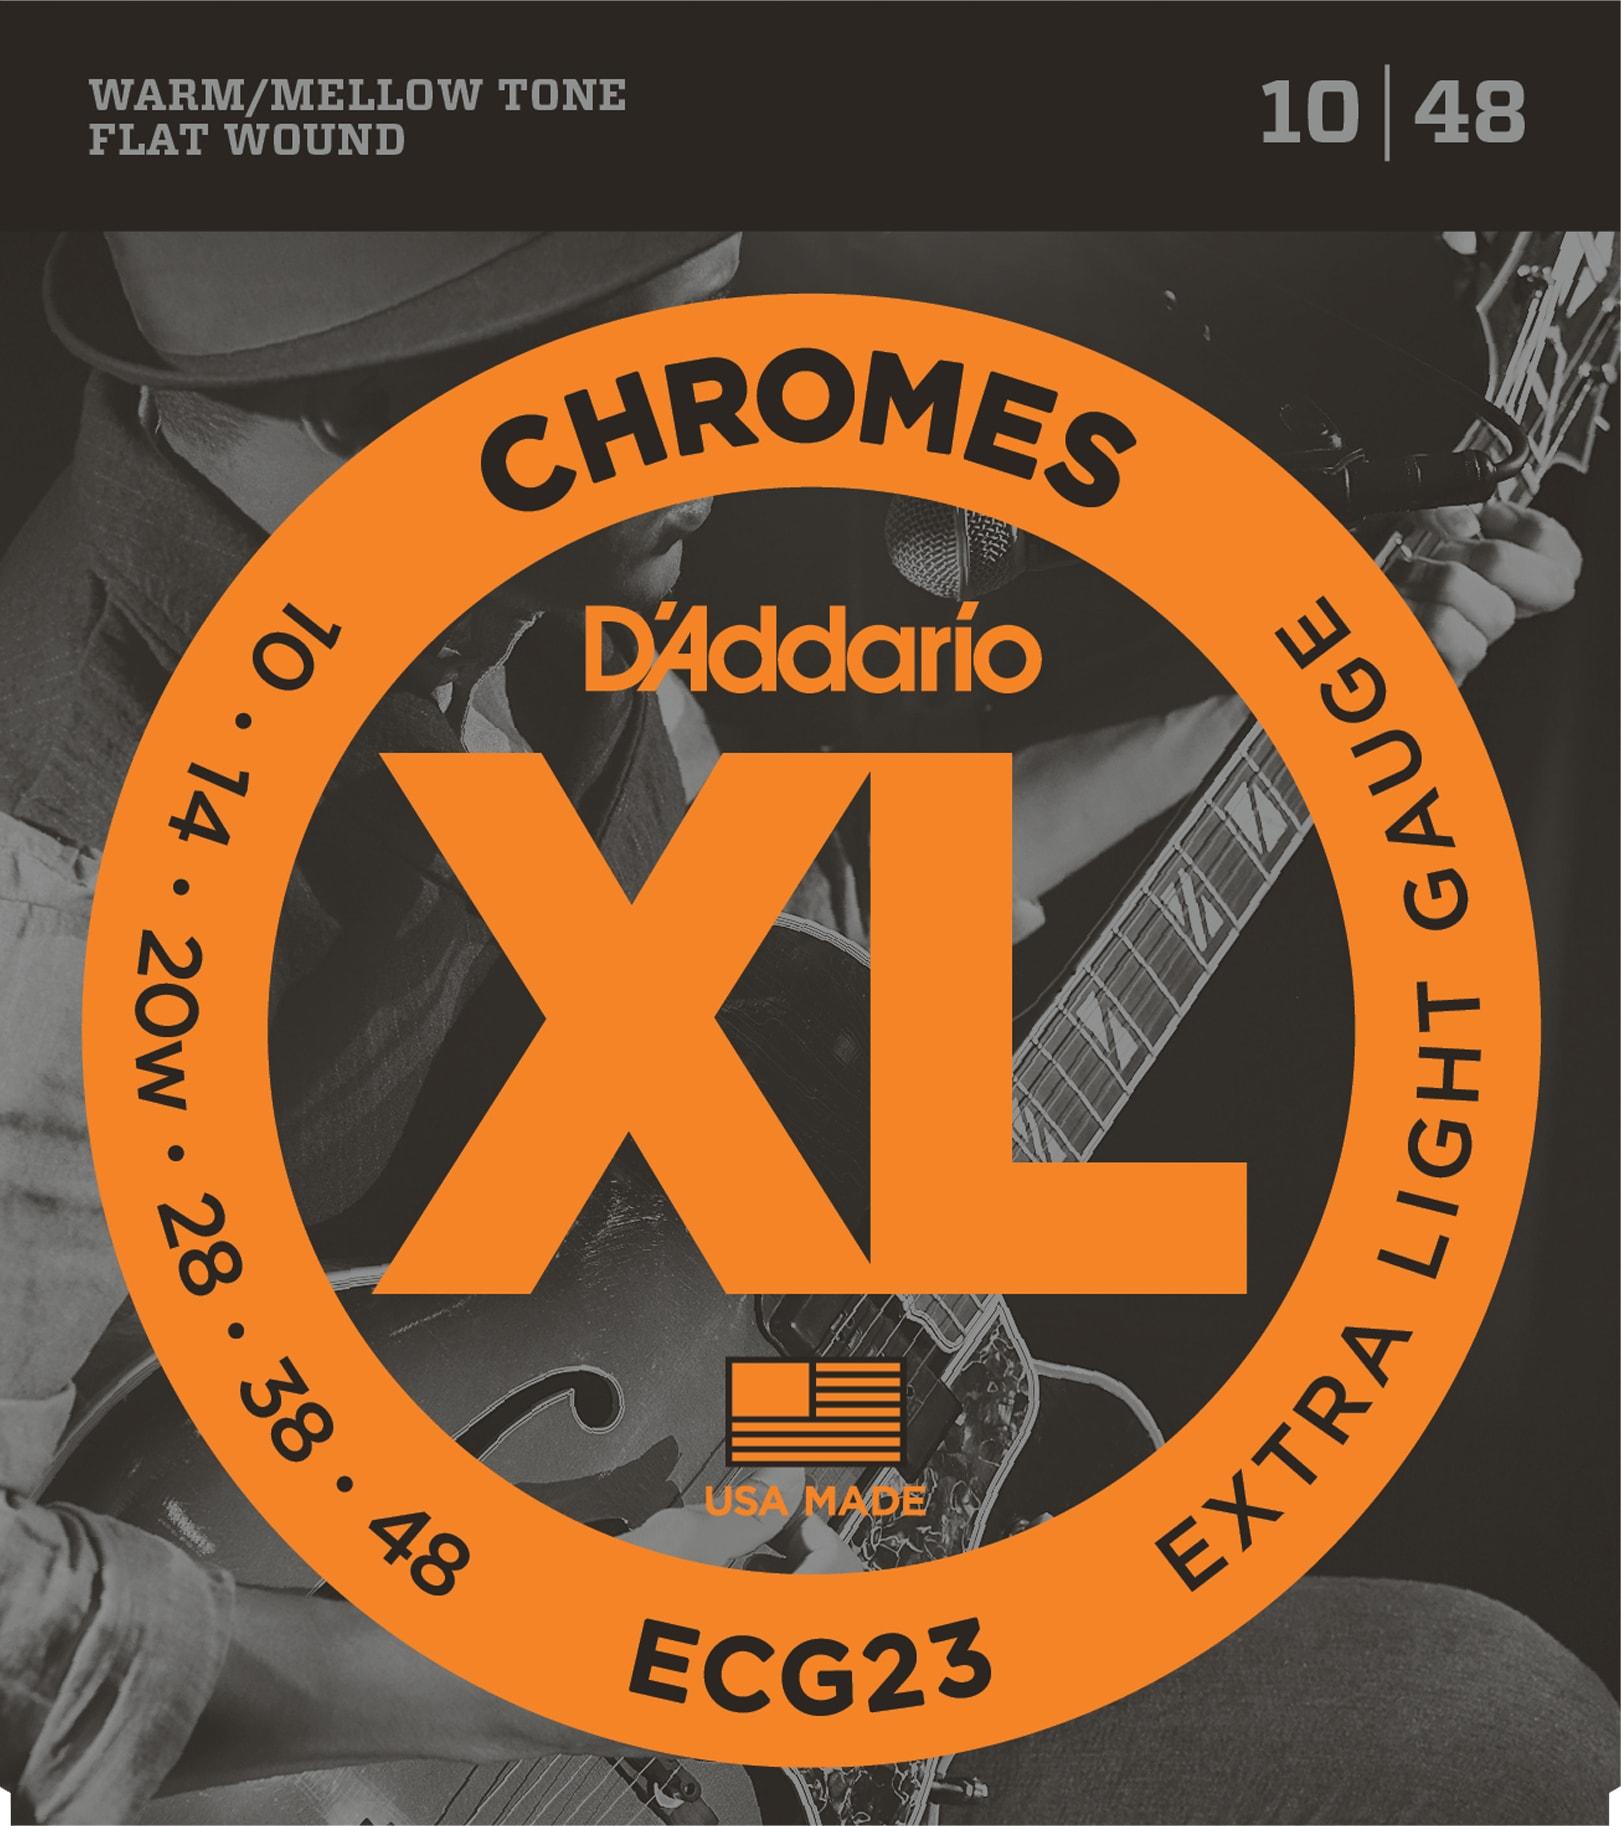 /D/-/D-addario-ECG23-Chromes-Flat-Wound-Electric-Guitar-Strings-Extra-Light---10-48-7537222.jpg